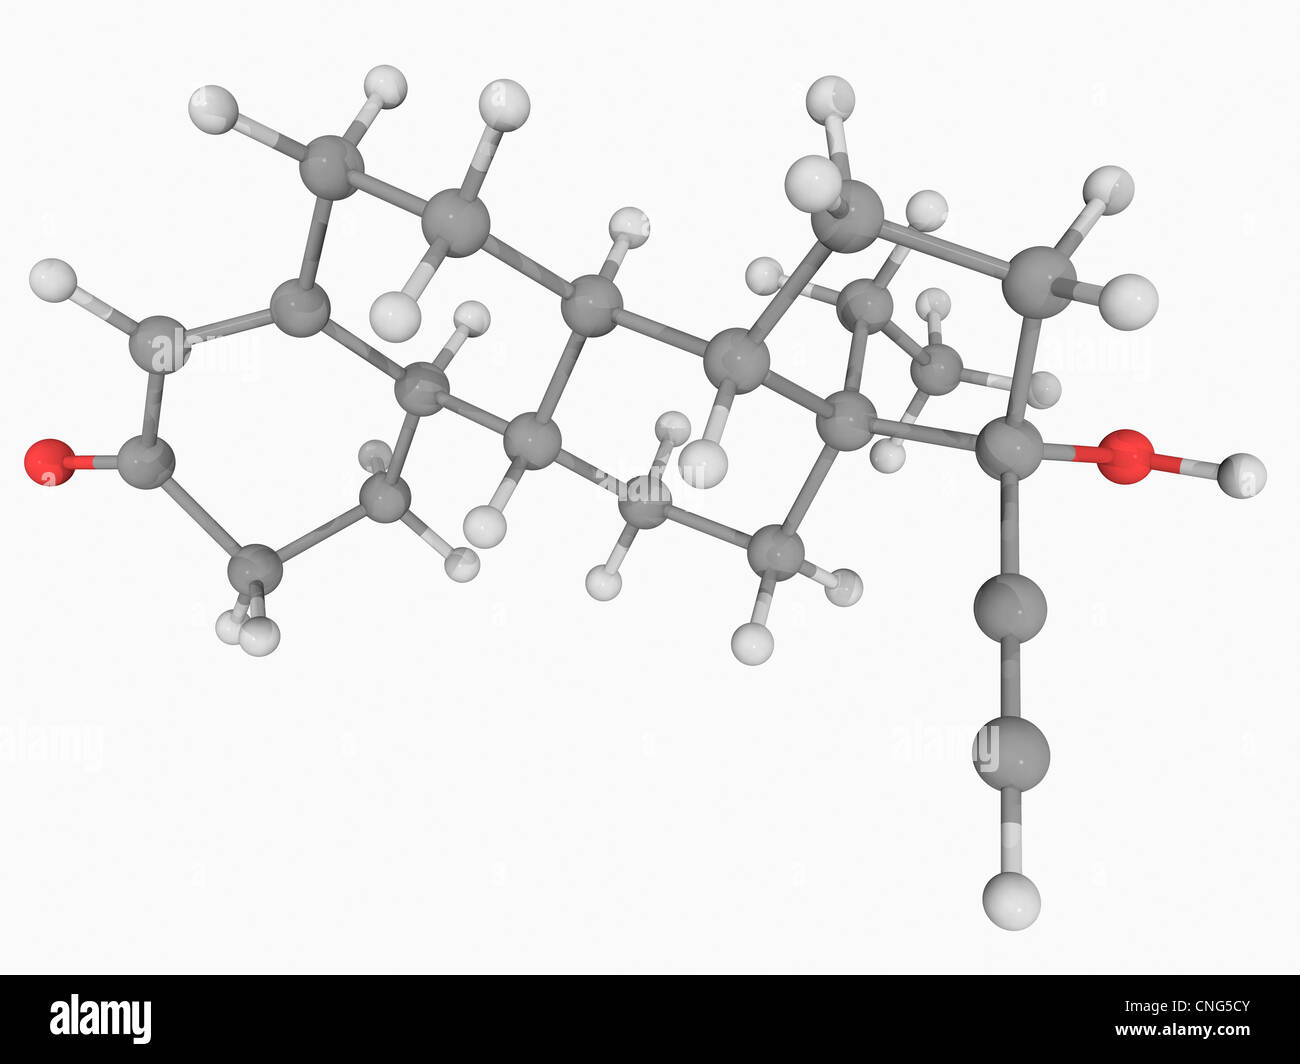 Levonorgestrel drug molecule - Stock Image